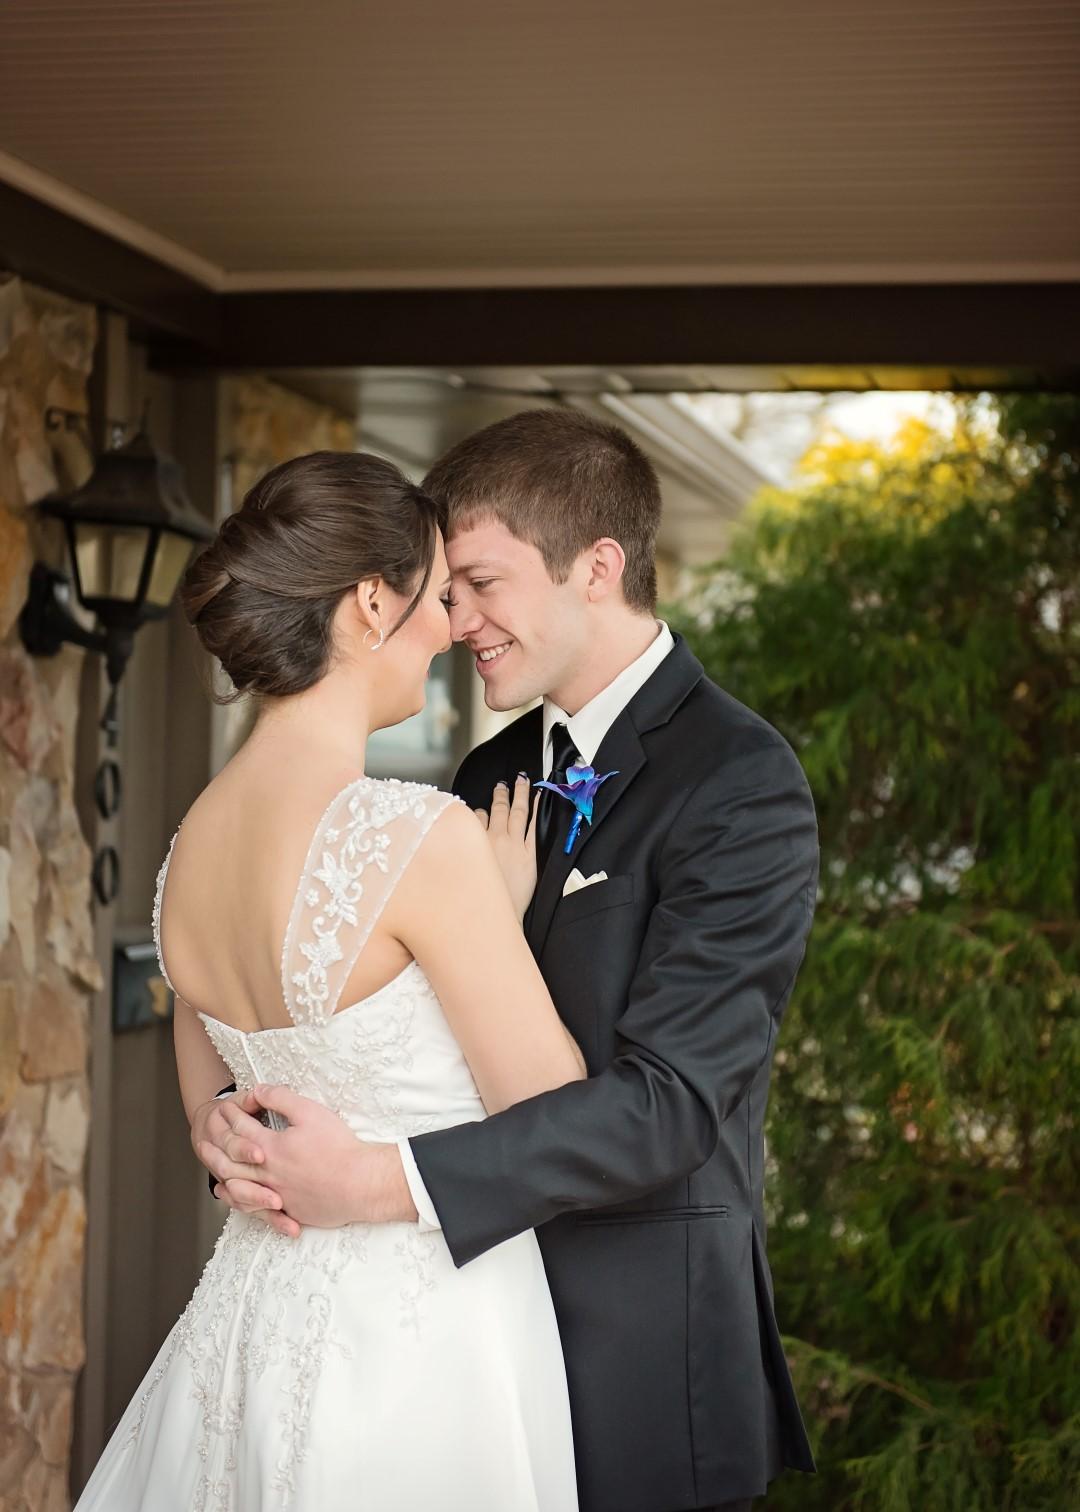 Haught Wedding 06 (Large).jpg